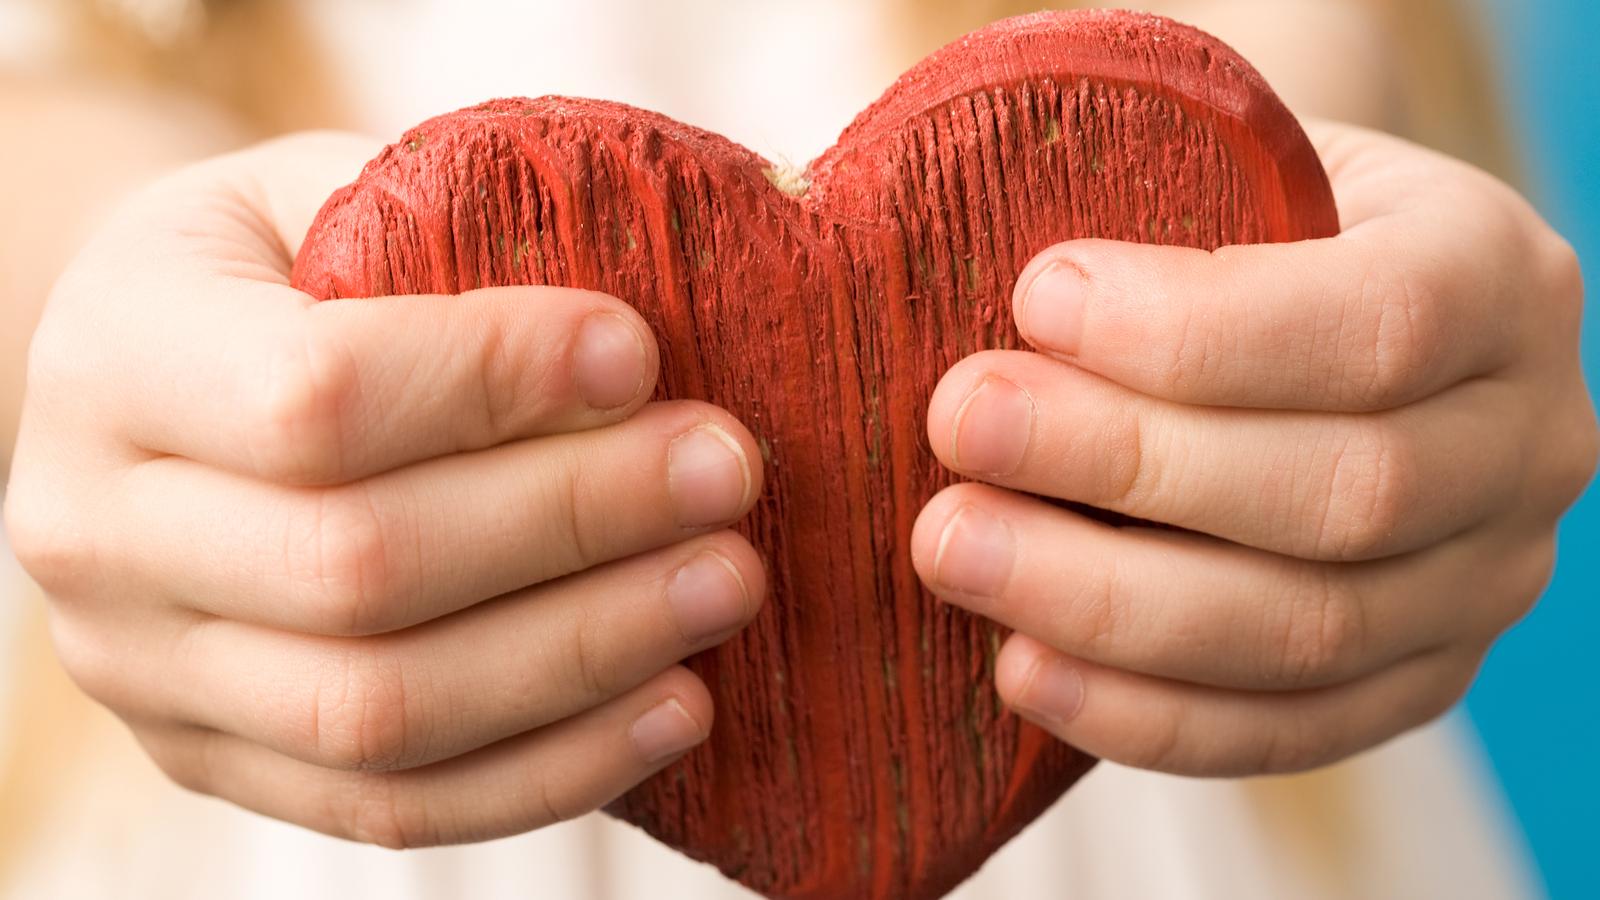 bigstock-Heart-In-Hands-4144391.jpg